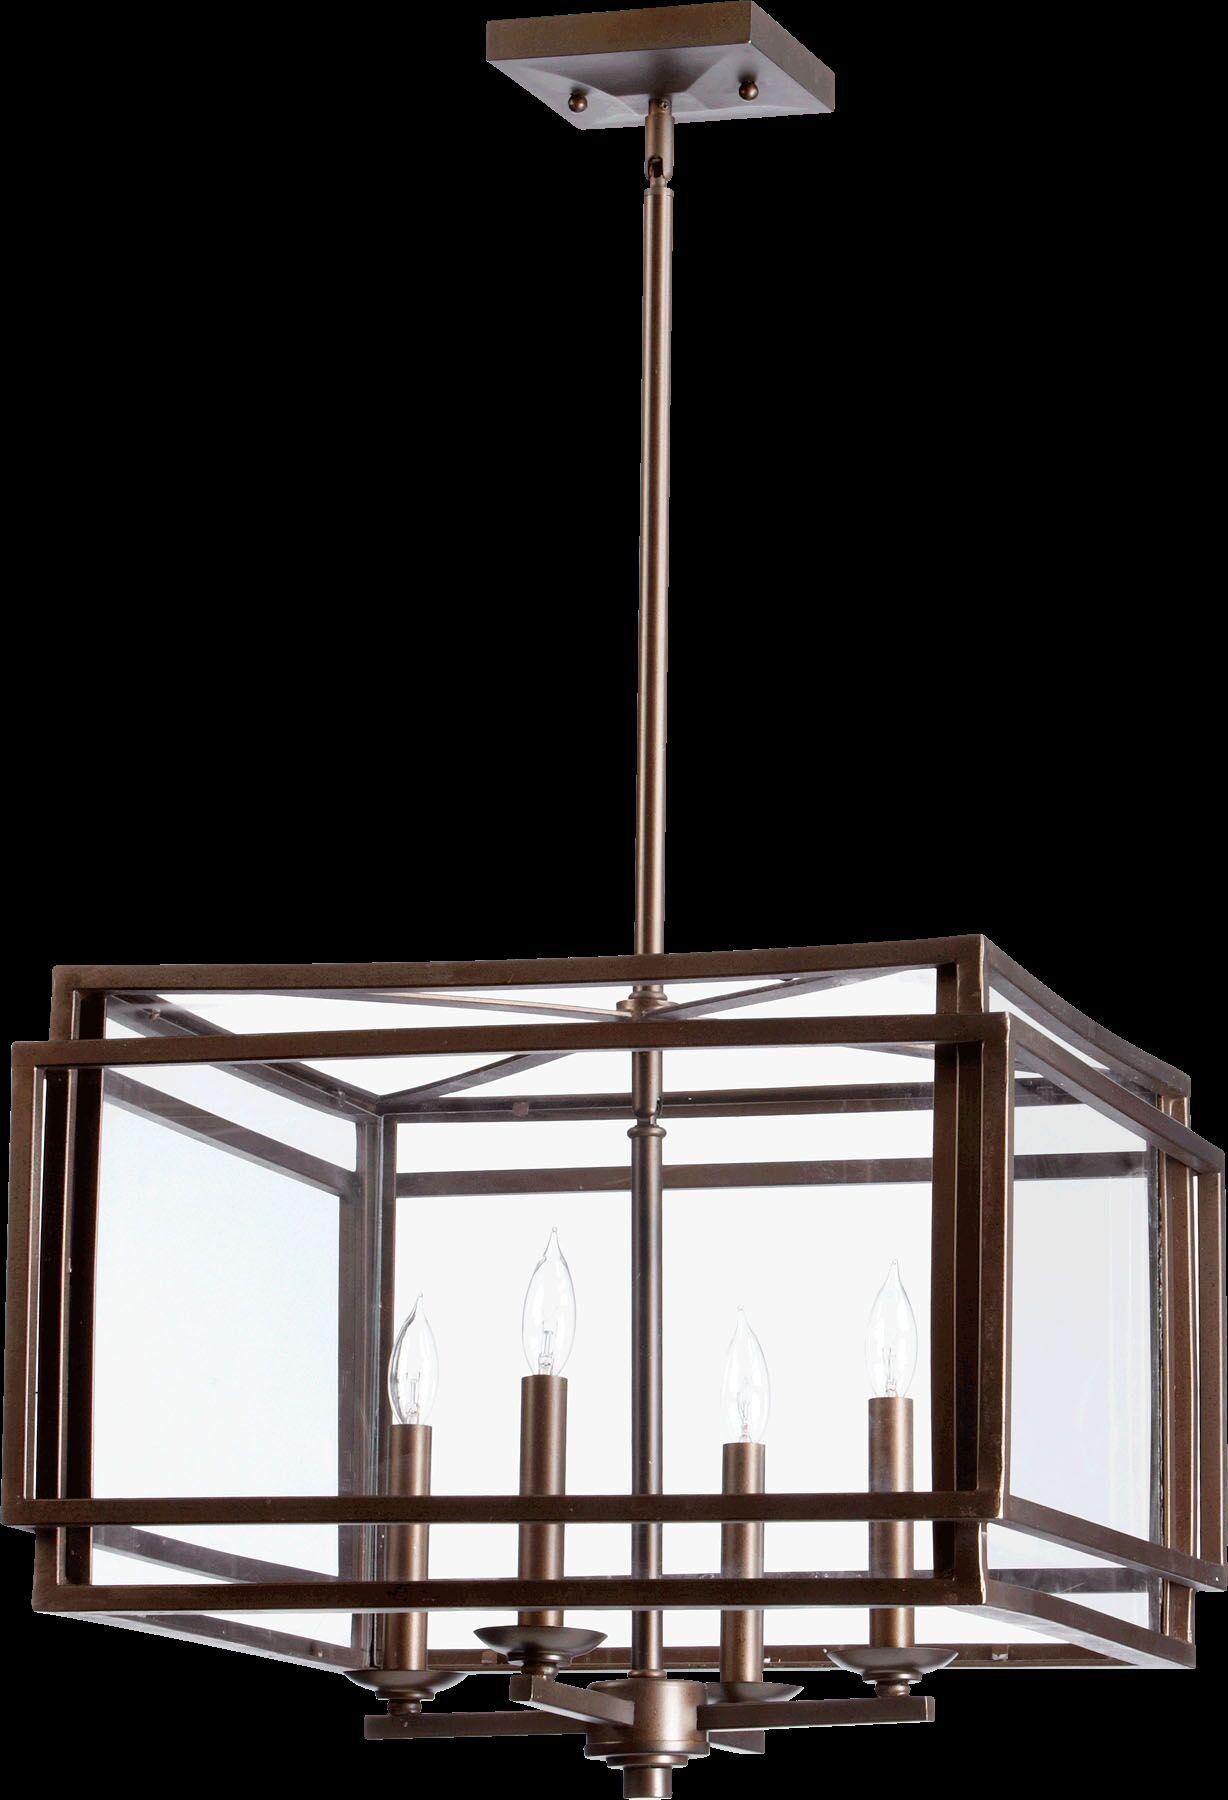 Politte 4-Light Square/Rectangle Chandelier